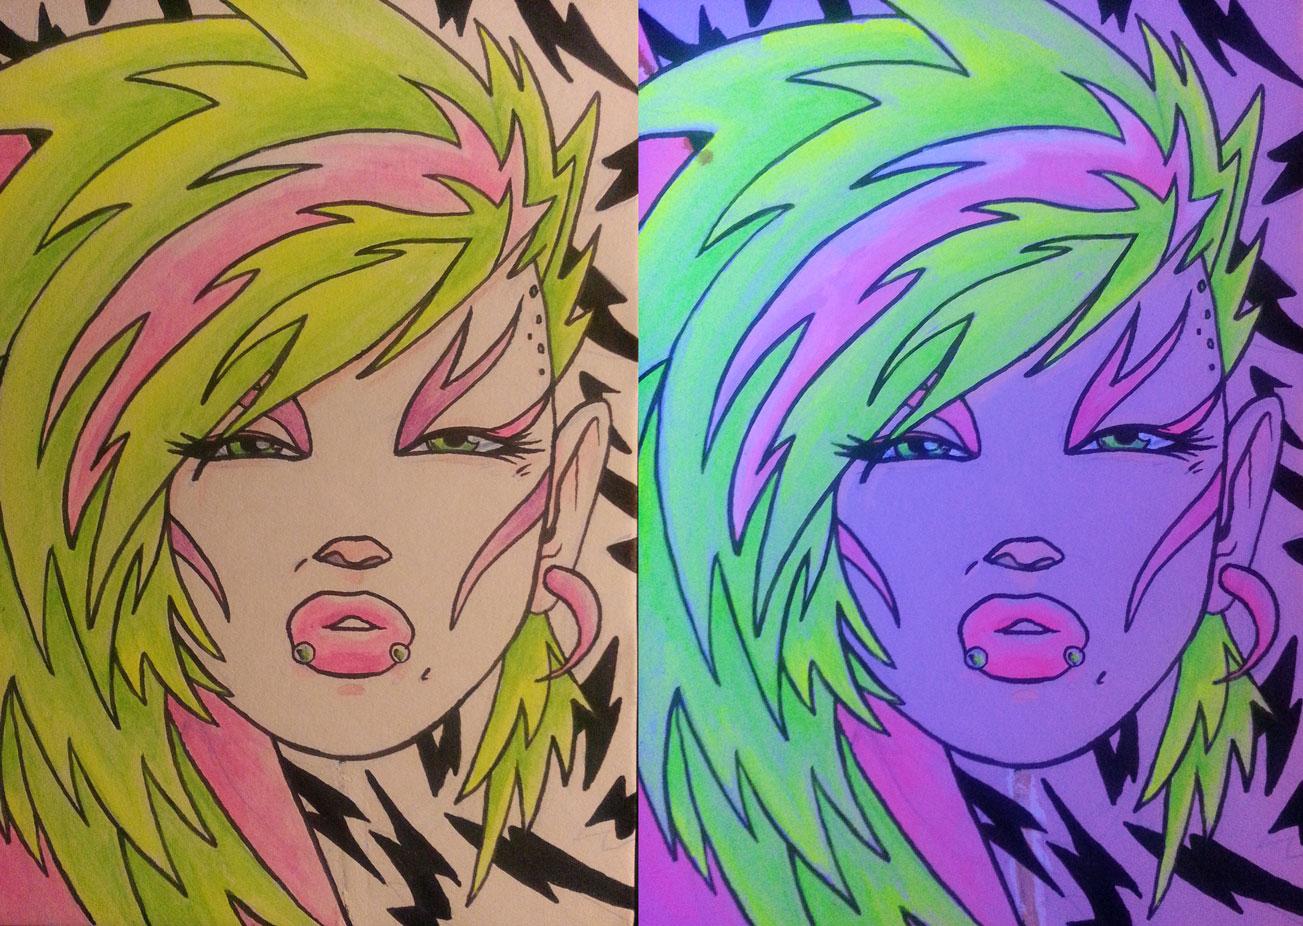 """Pizzazz"" - 5"" x 7"" acrylic on matte board w/ black light"